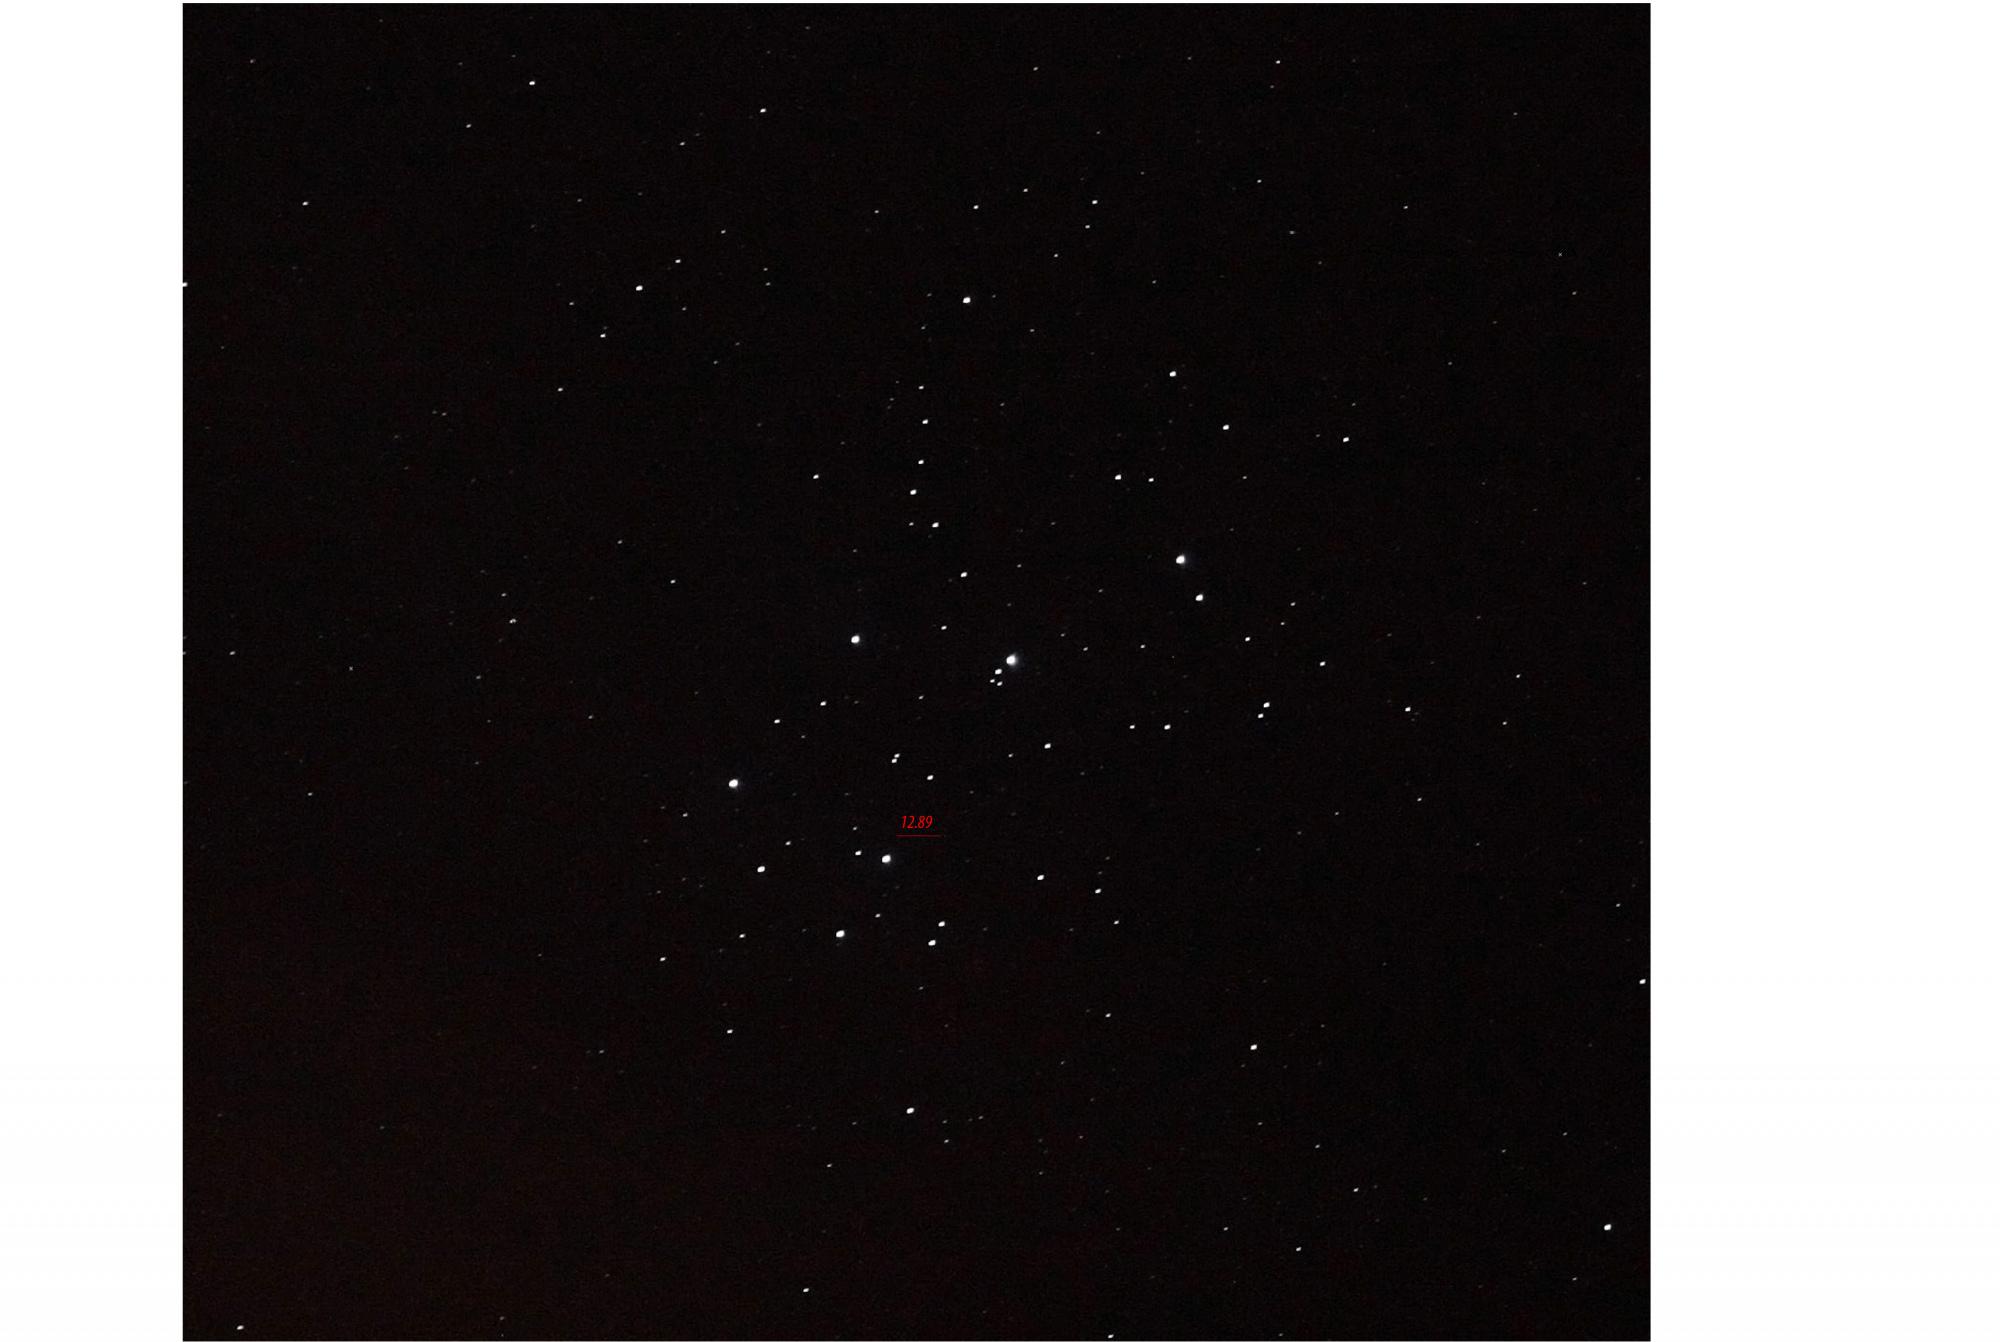 1-Pleiades.jpg